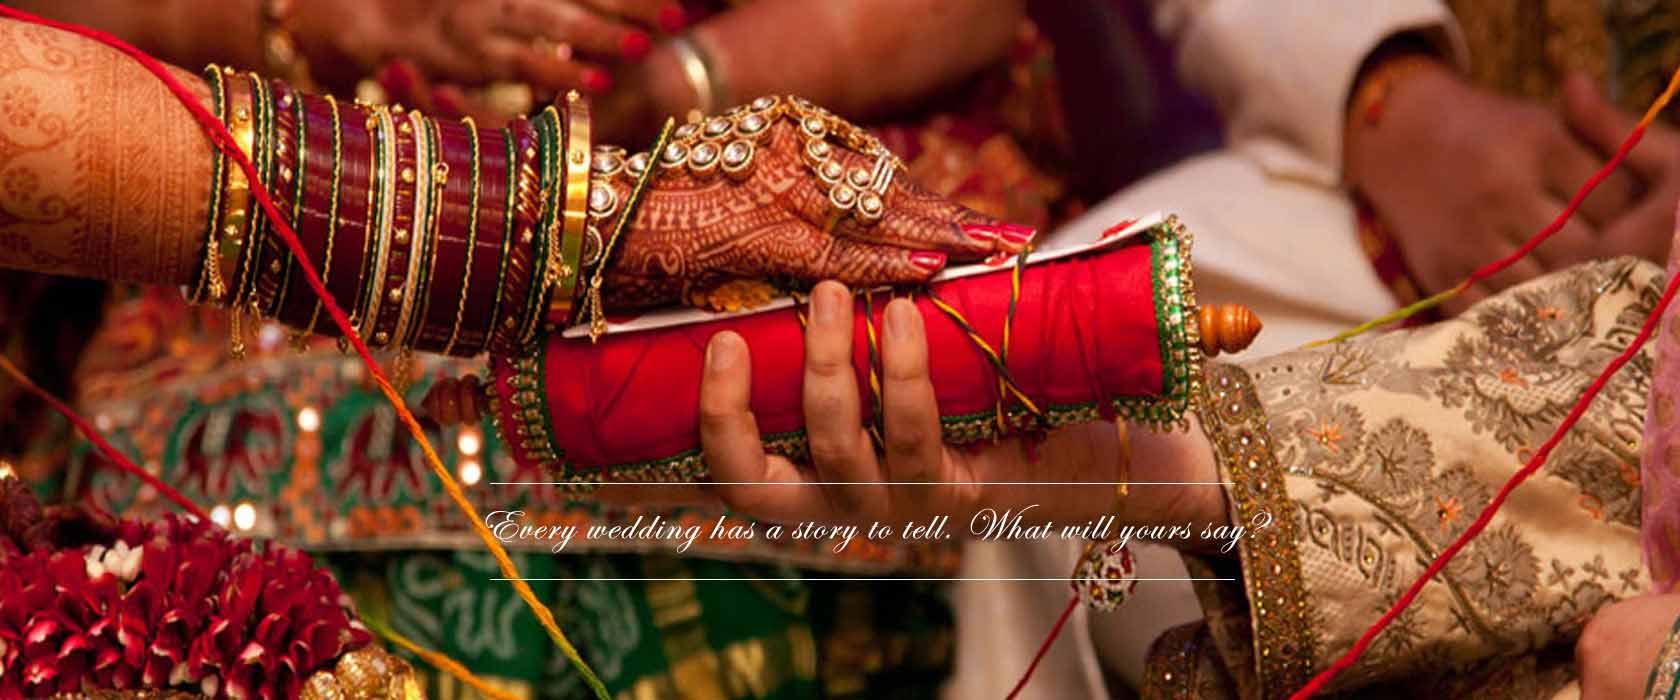 Bengali actress wedding photos Clear cache & cookies - Computer - Google Account Help